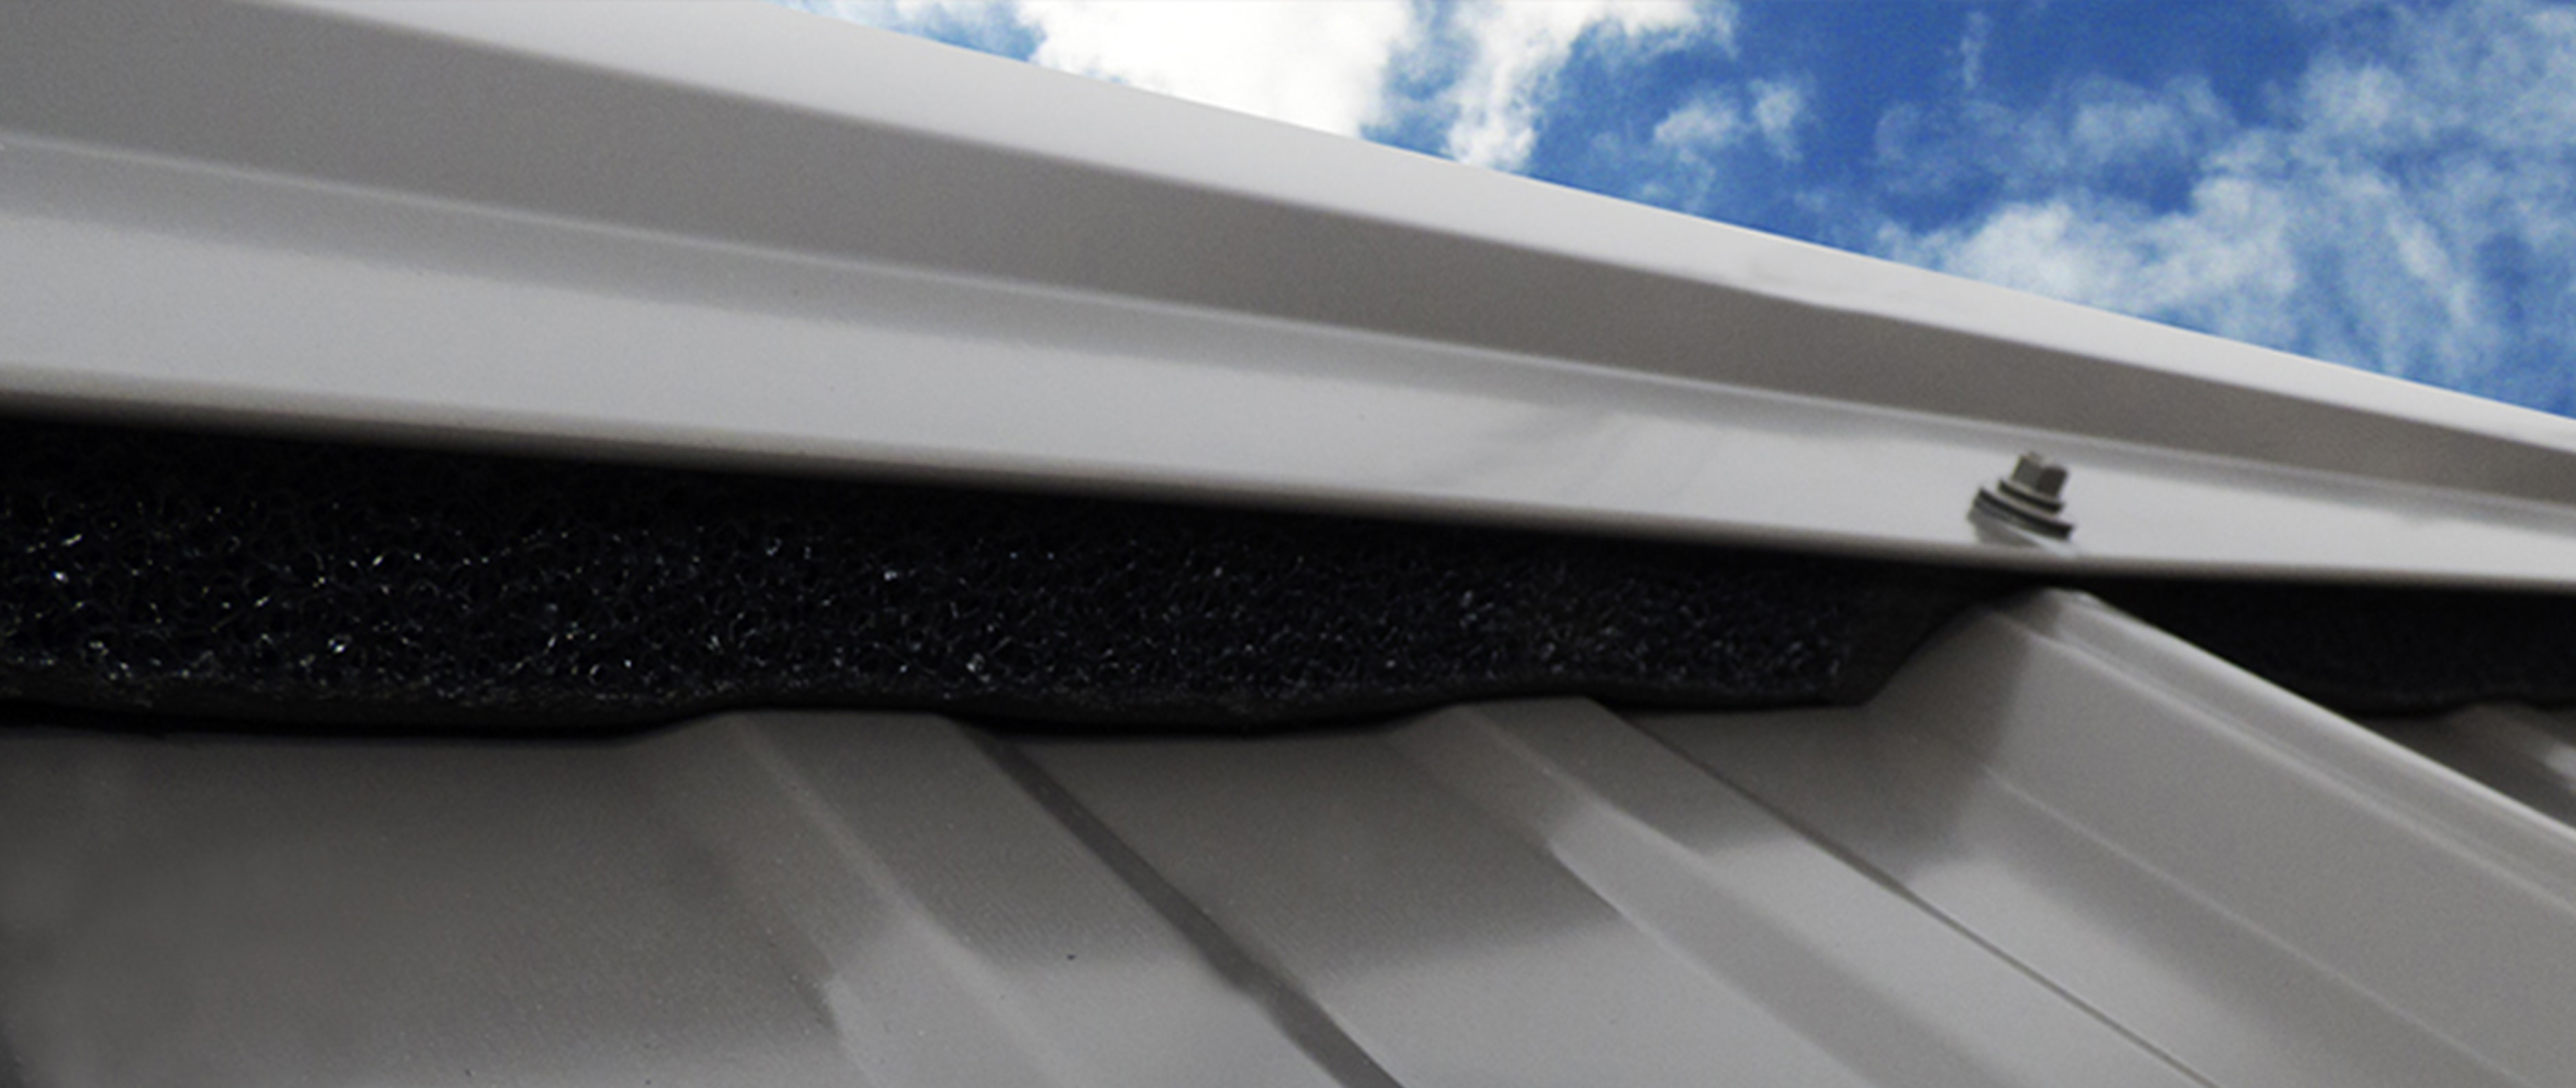 Fastvent Plus vented closure on metal roof